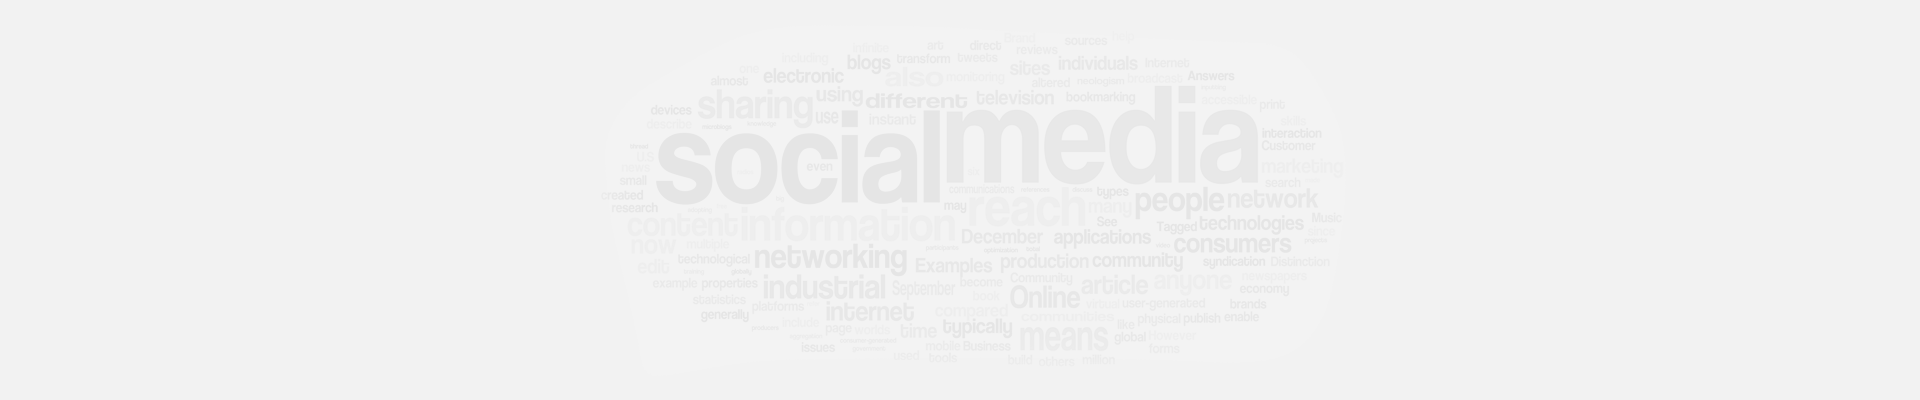 socialbg